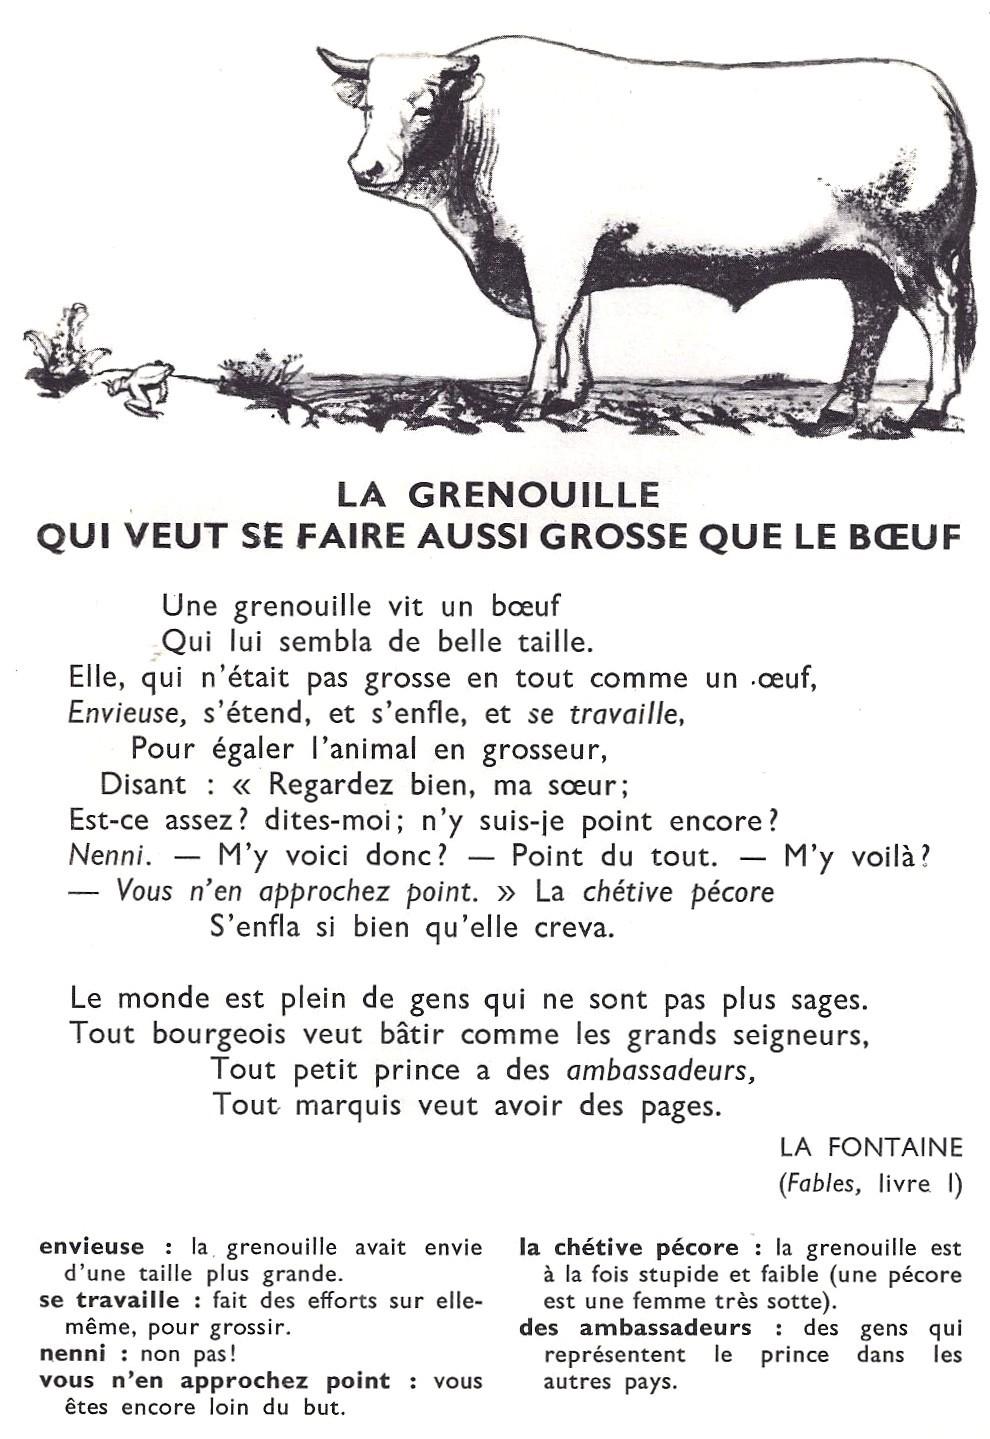 poesie grenouille boeuf